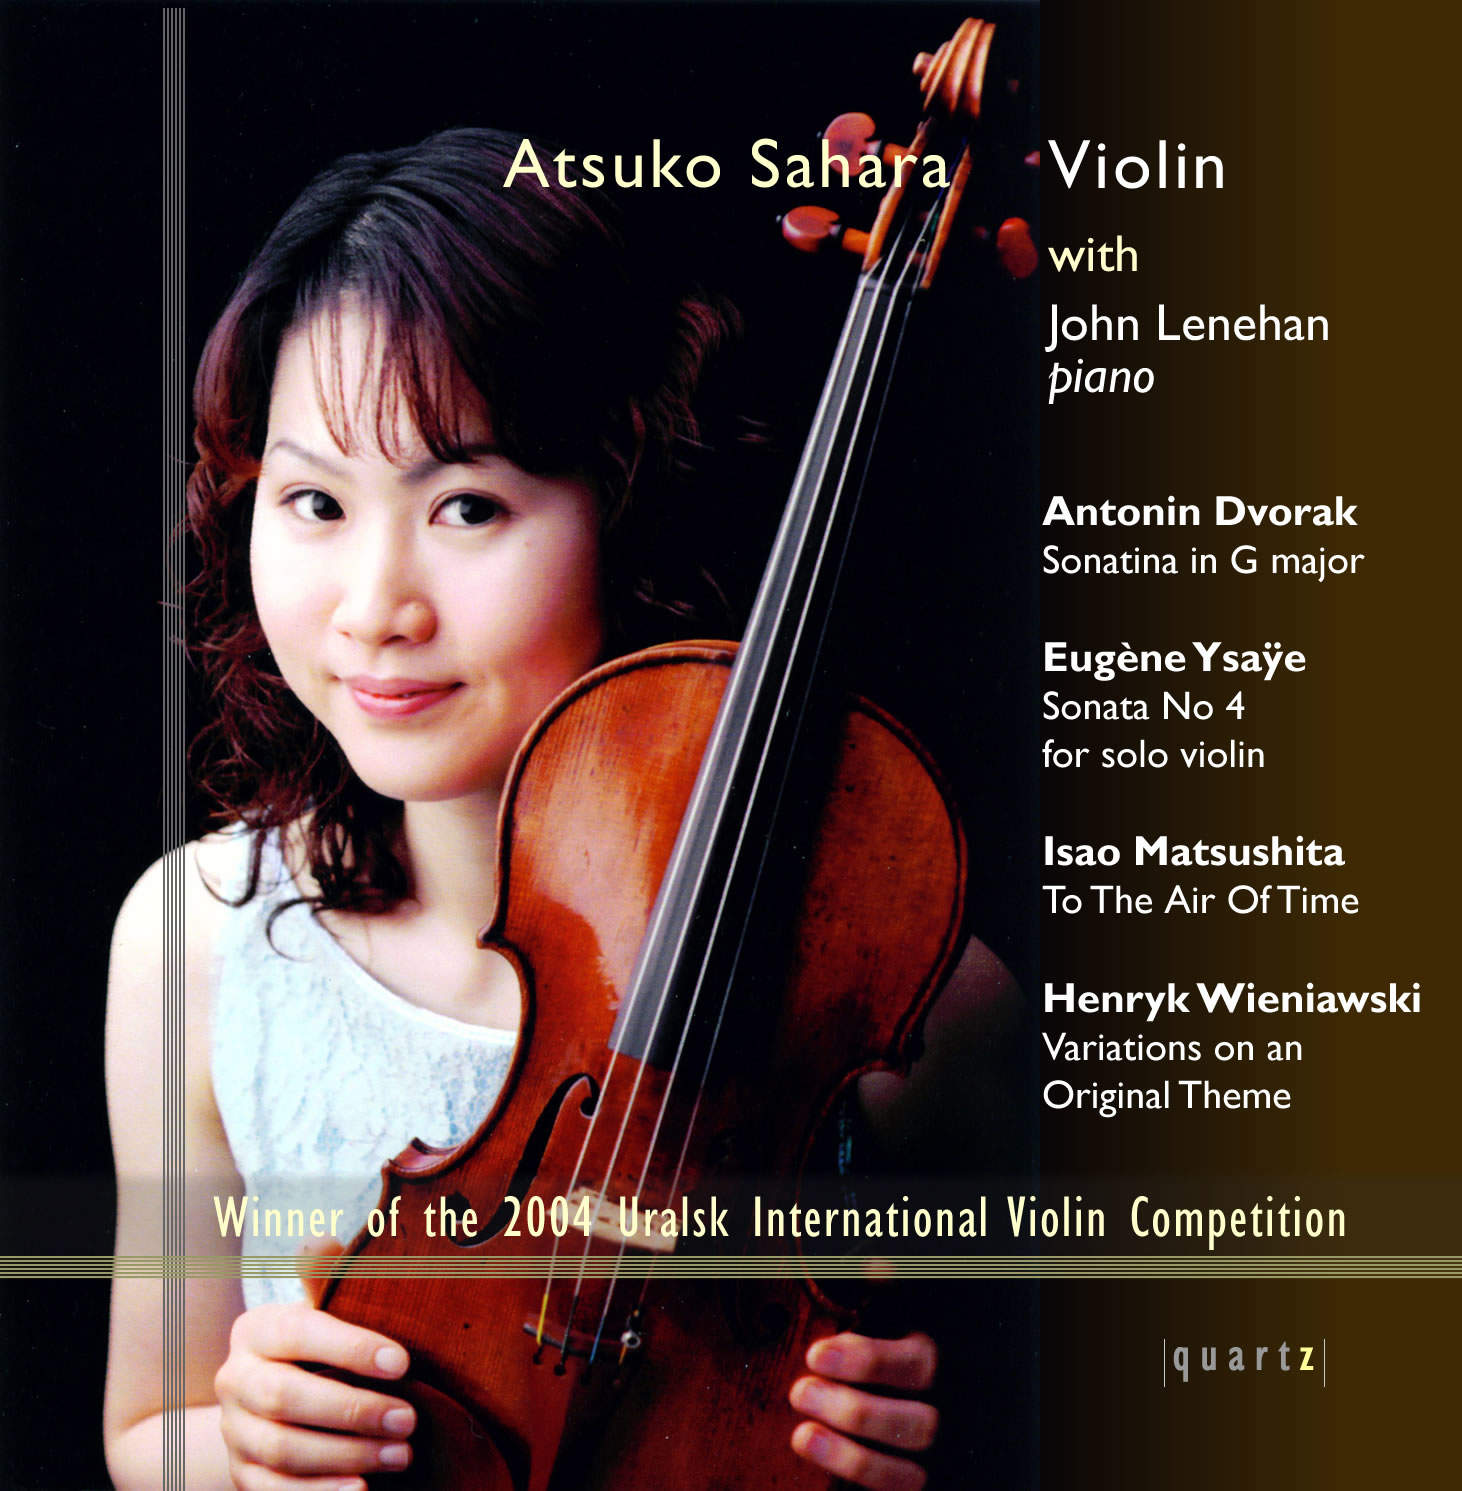 Atsuko Sahara (violin) and John Lenehan (piano)